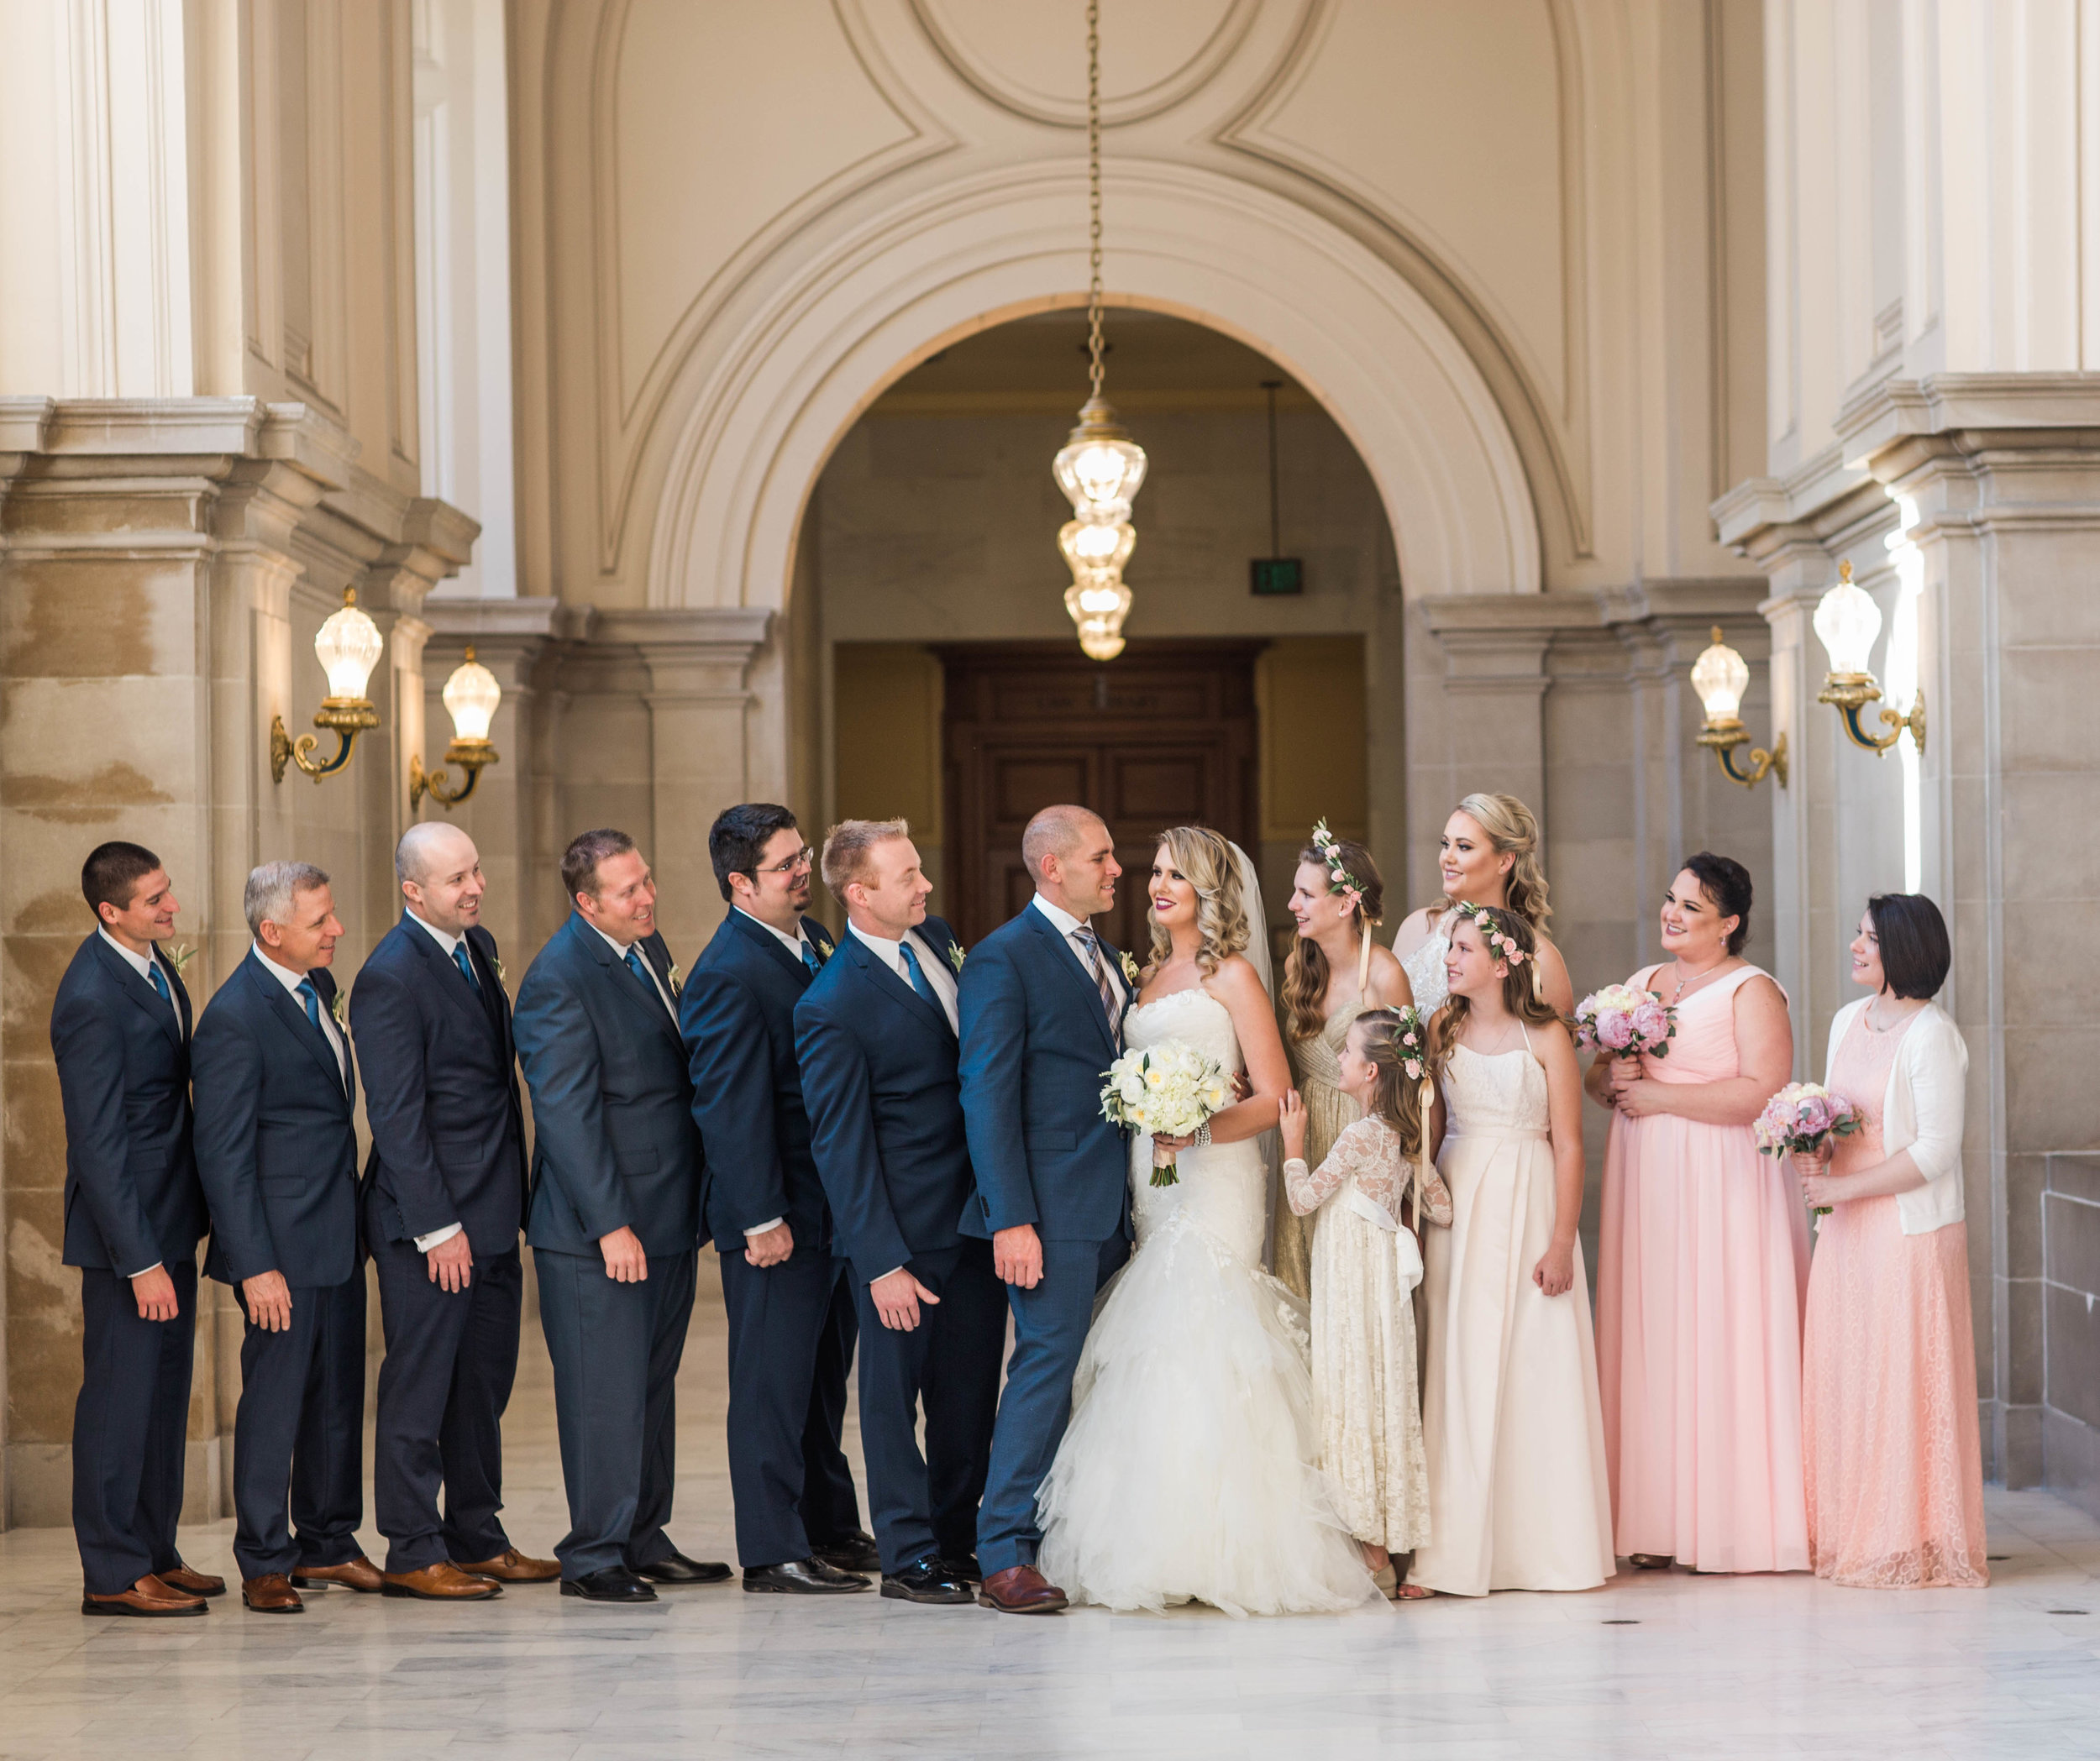 san-francisco-city-hall-wedding-kimberly-macdonald-photography467 copy.jpg